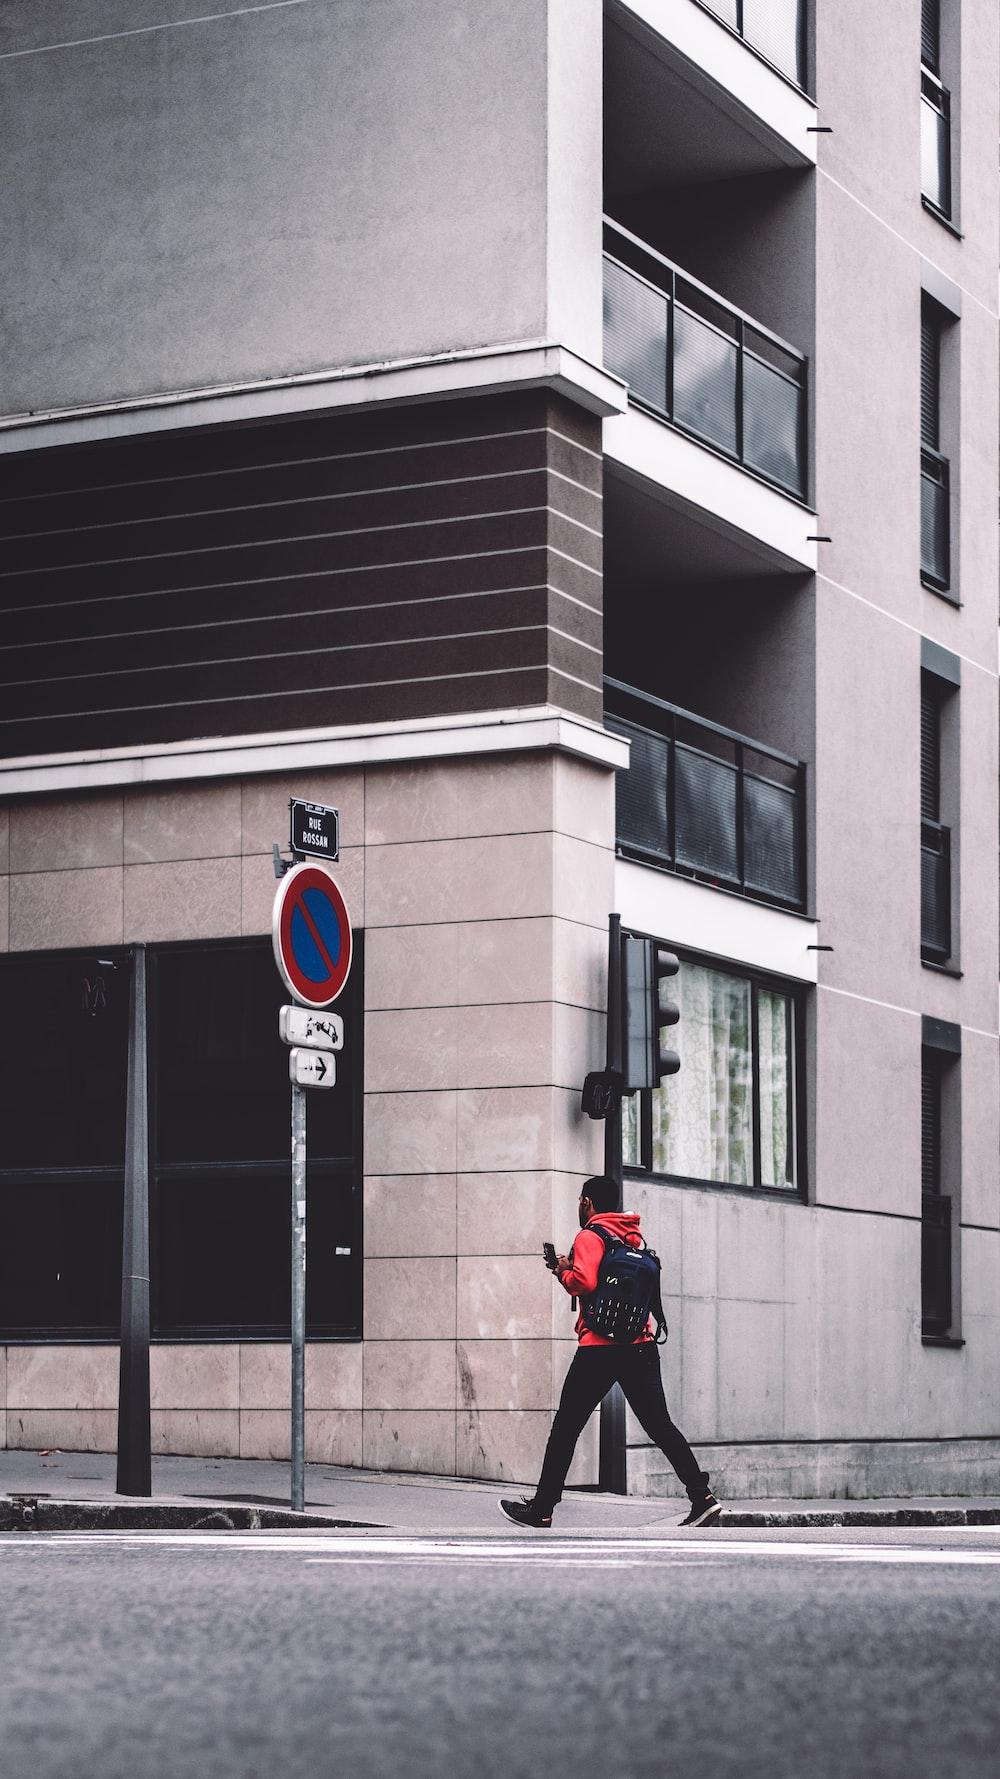 man walking on sidewalk beside signboard and building